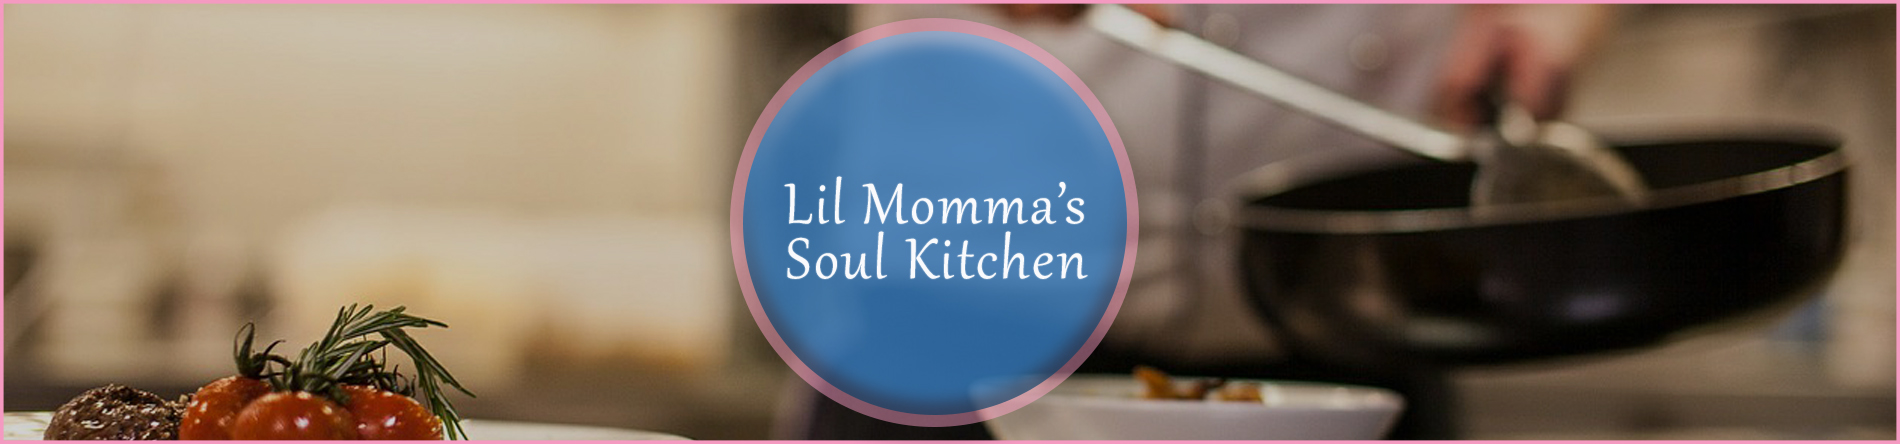 Lil Momma\'s Soul Kitchen is a Soul Food Restaurant in Norfolk, VA